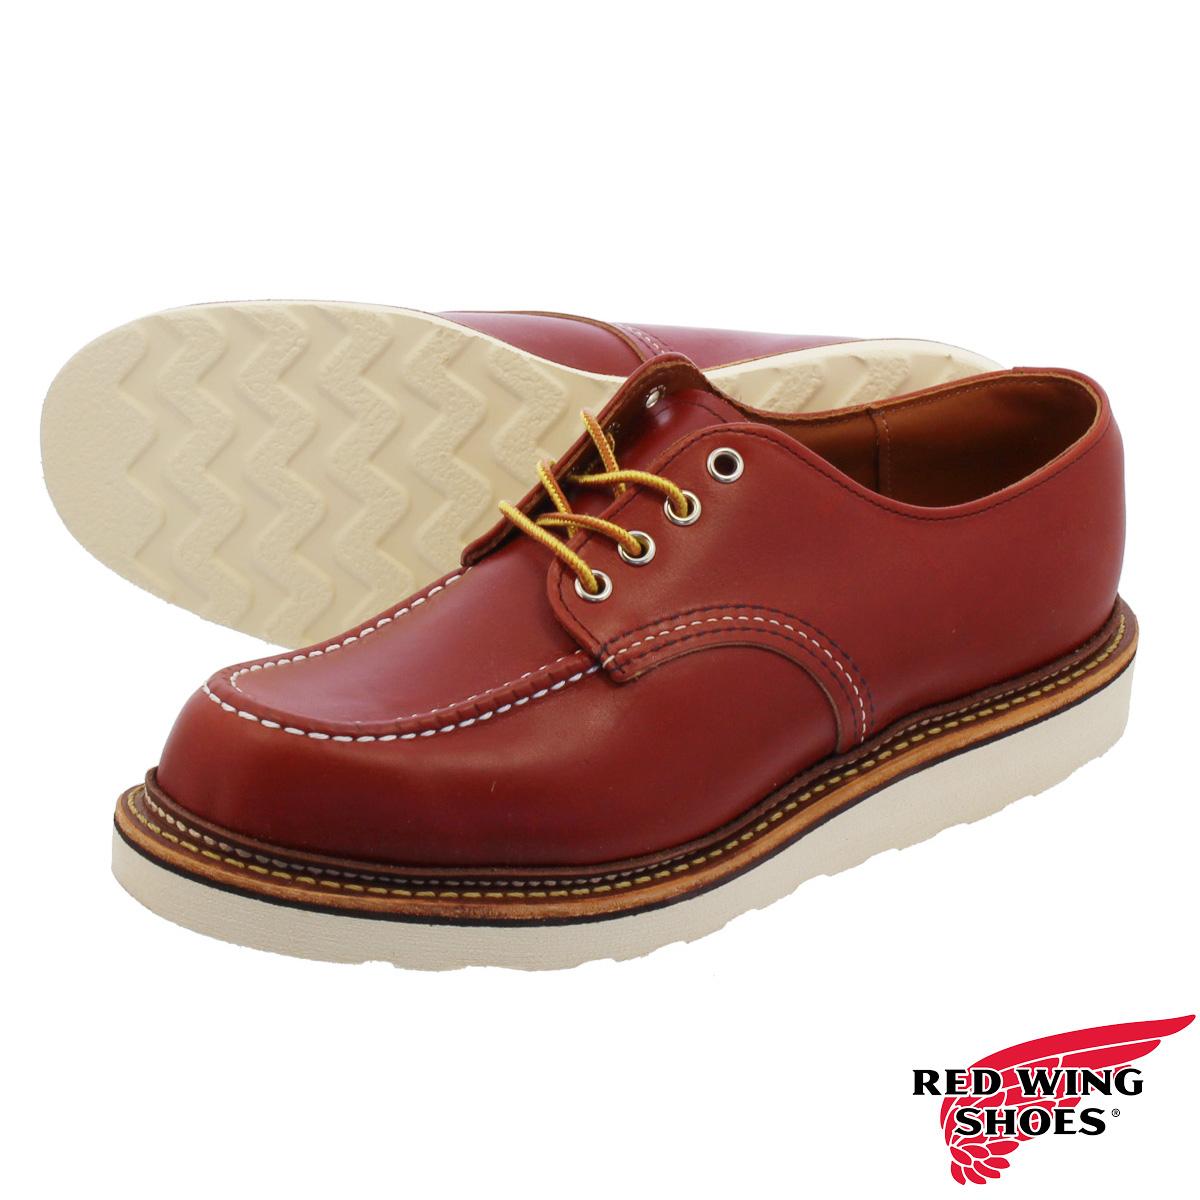 RED WING CLASSIC OXFORD 【Dワイズ】 レッドウイング ベックマン オックスフォード ORO RUSSET PORTAGE LEATHER rw-8103